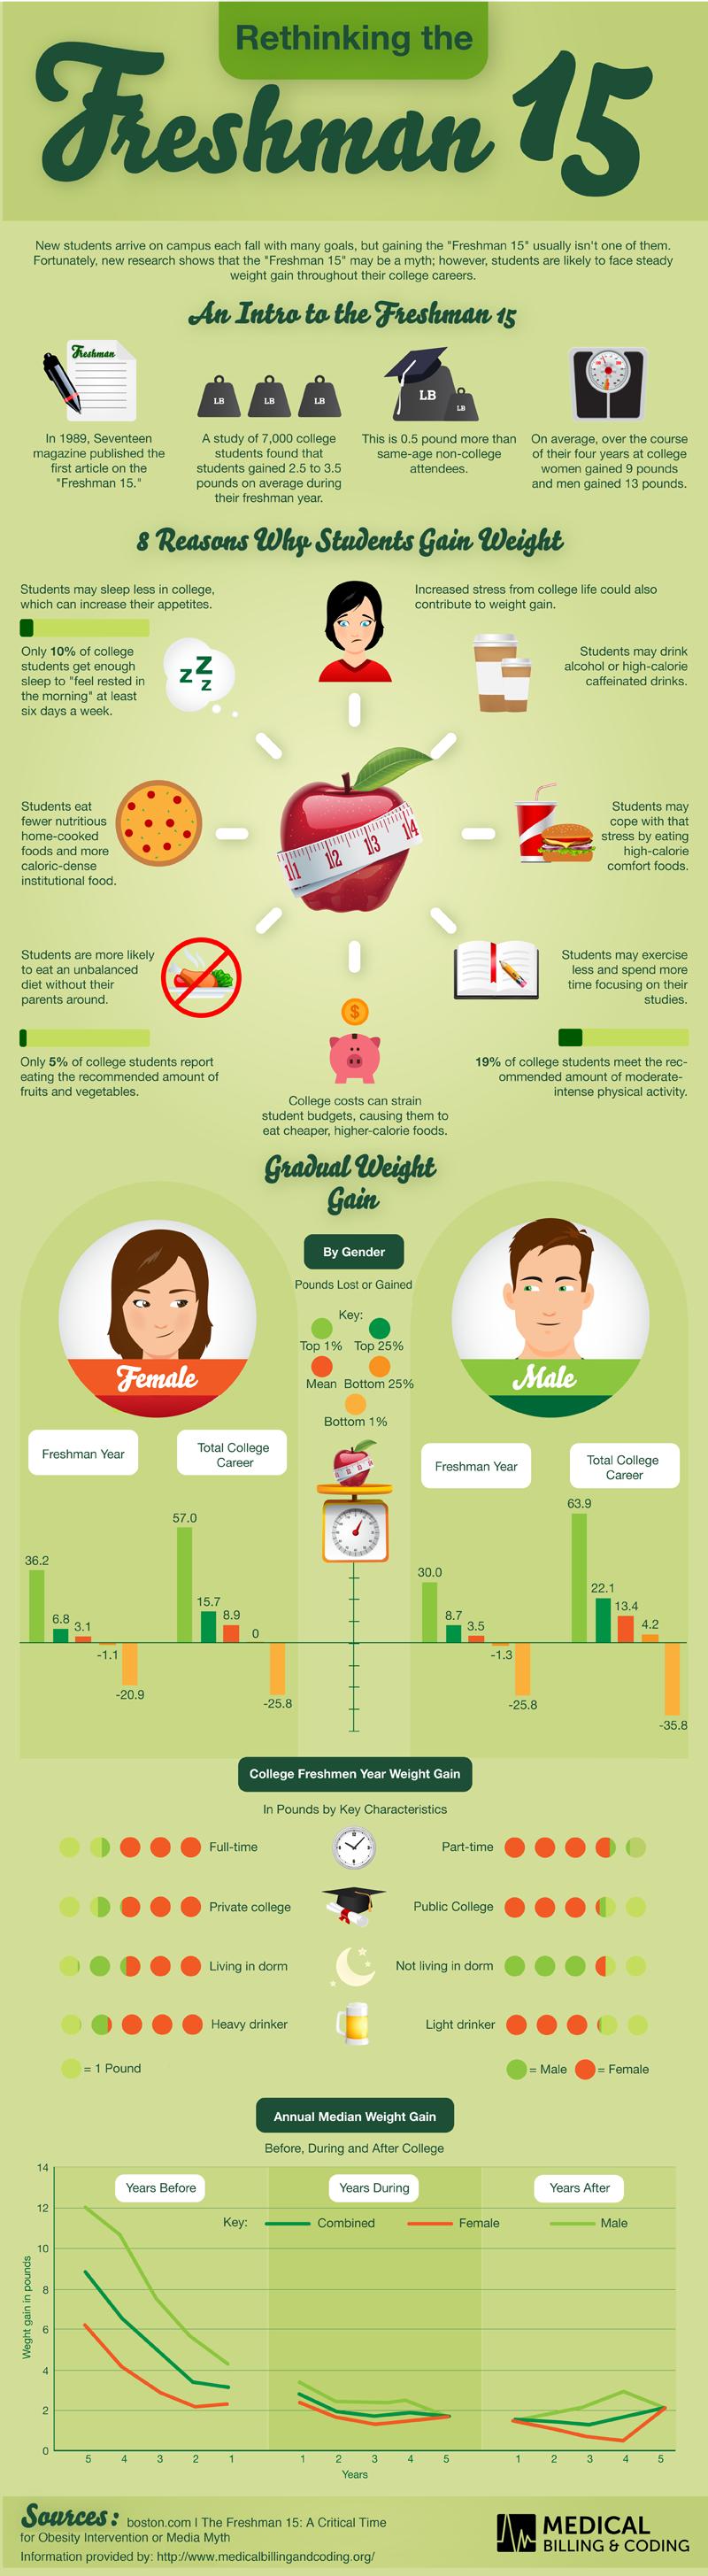 Freshman-15-infographic